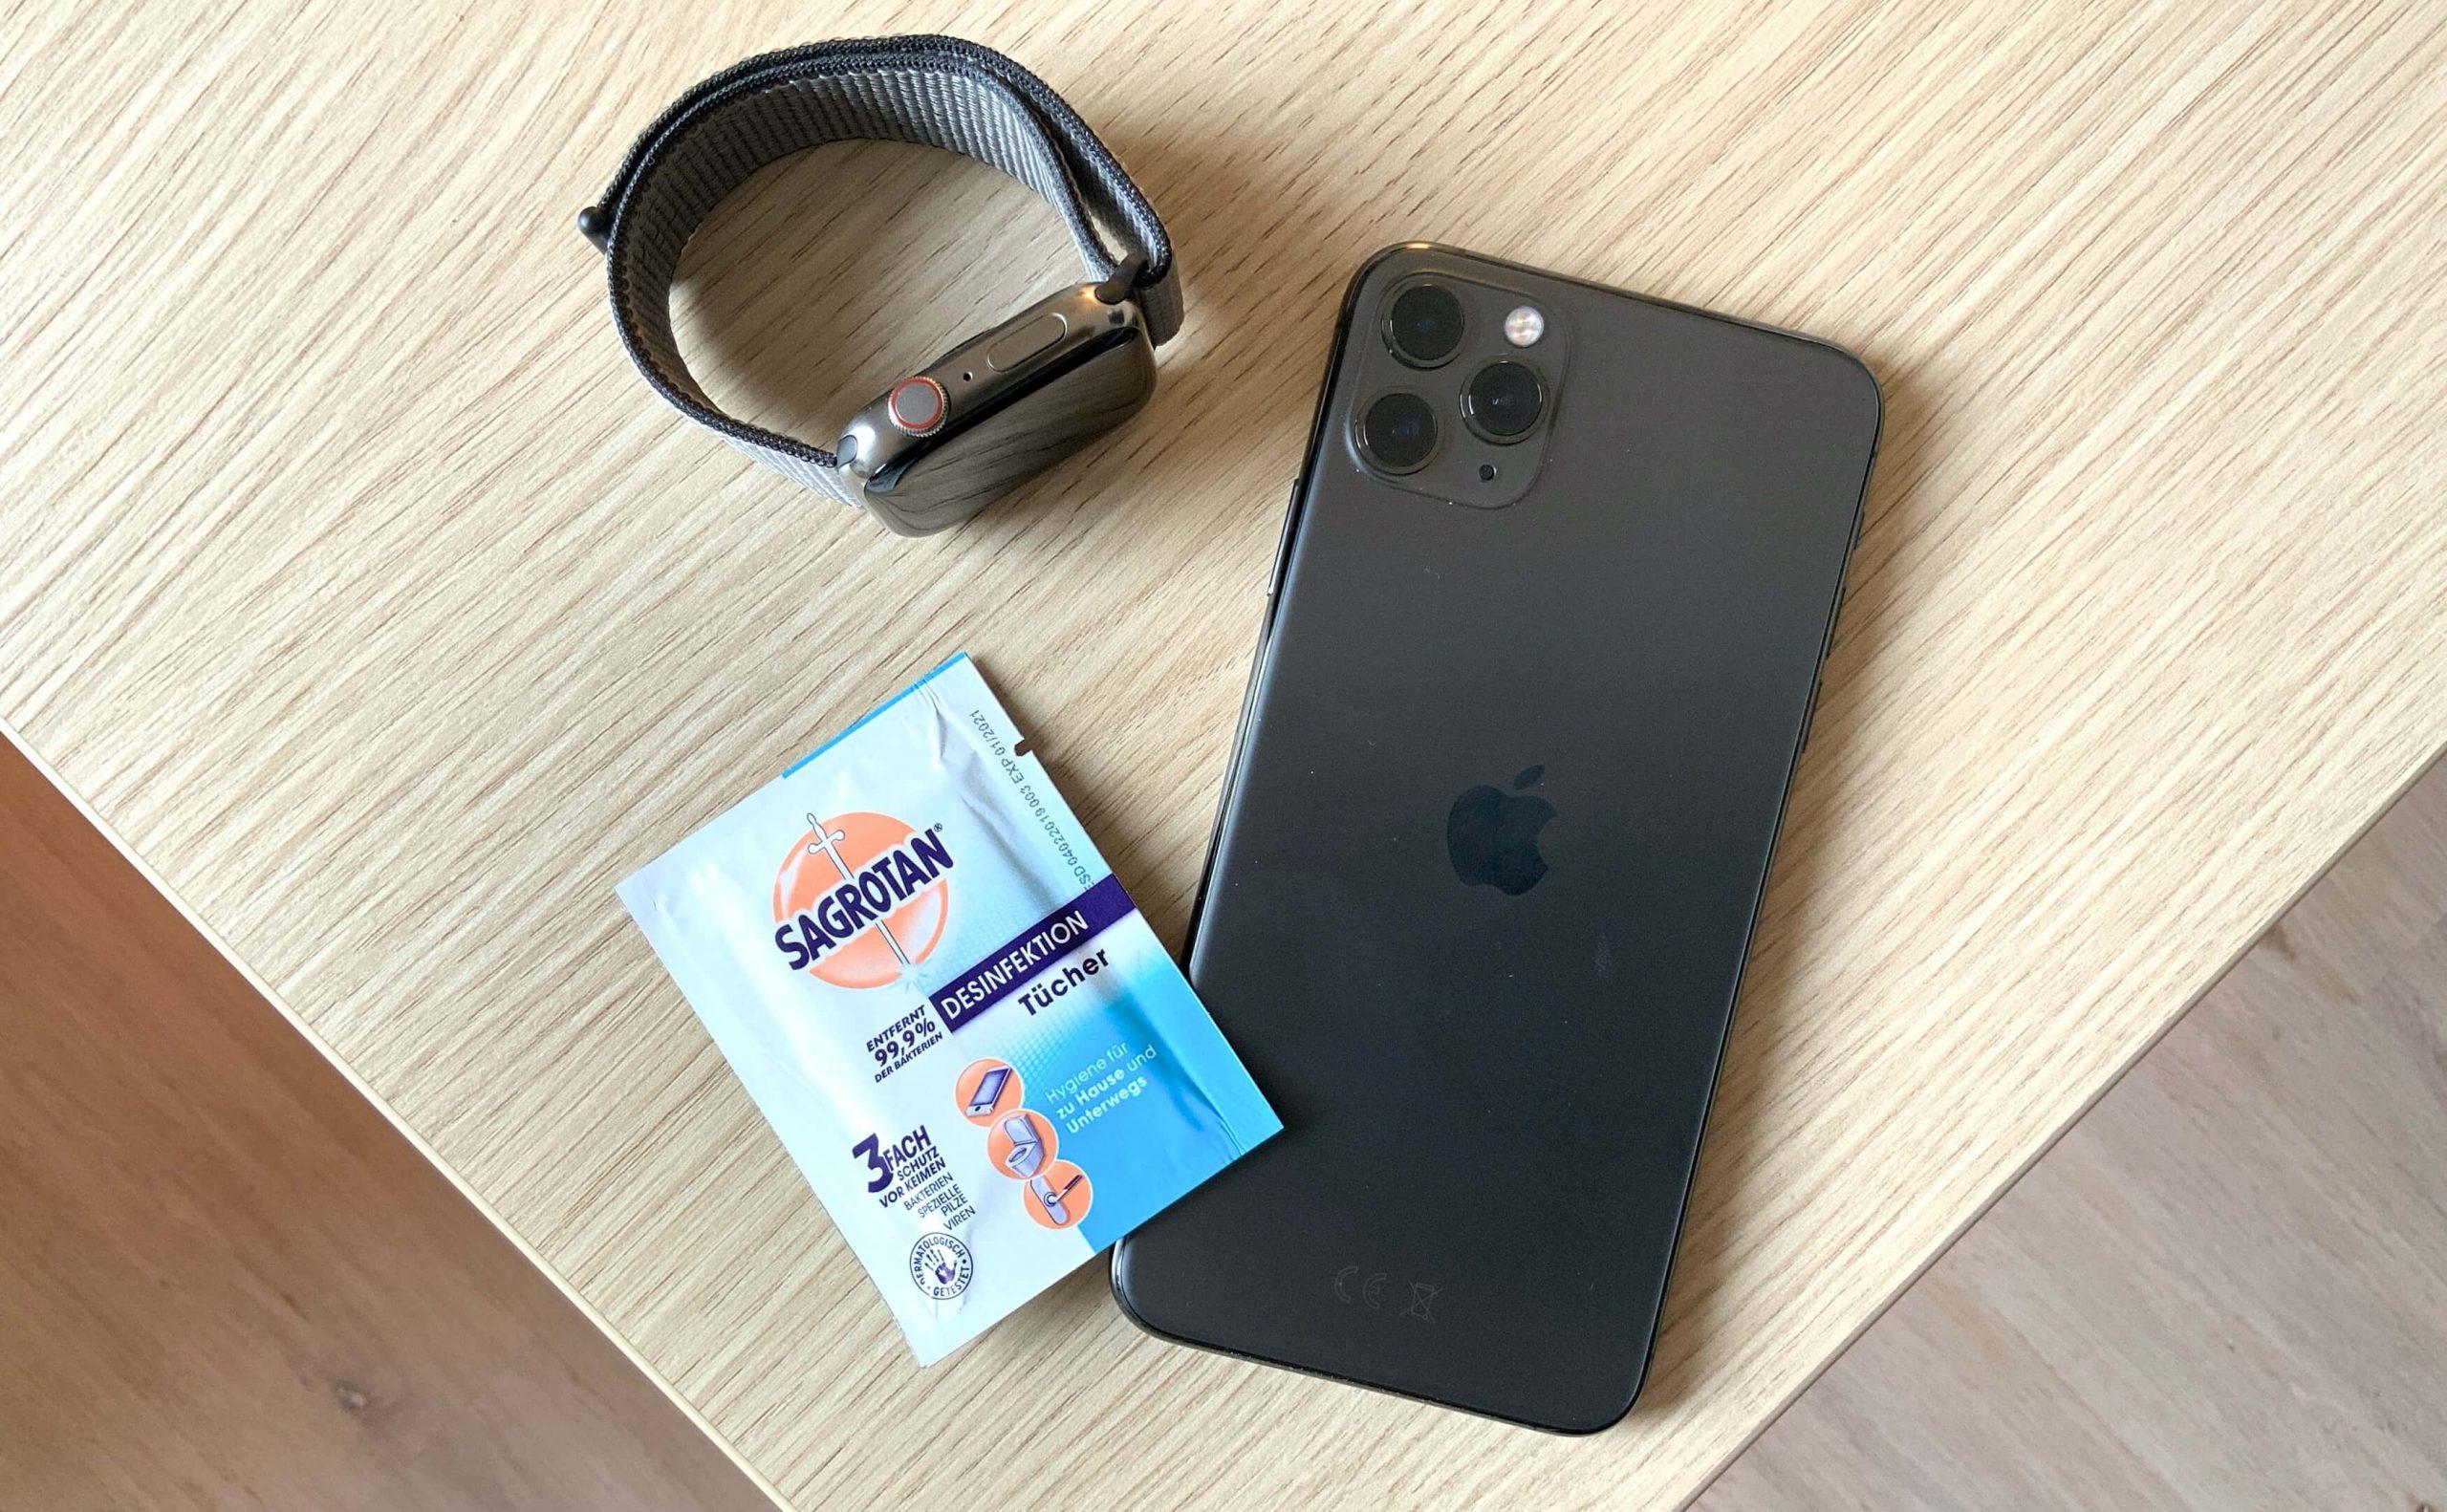 Corona_Virus_COVID19_COVID_iPhone_Apple_Watch_iPad_Mac_Desinfizieren-scaled Schutz gegen Corona Virus: iPhone, iPad, Apple Watch, Mac und Co. korrekt desinfizieren